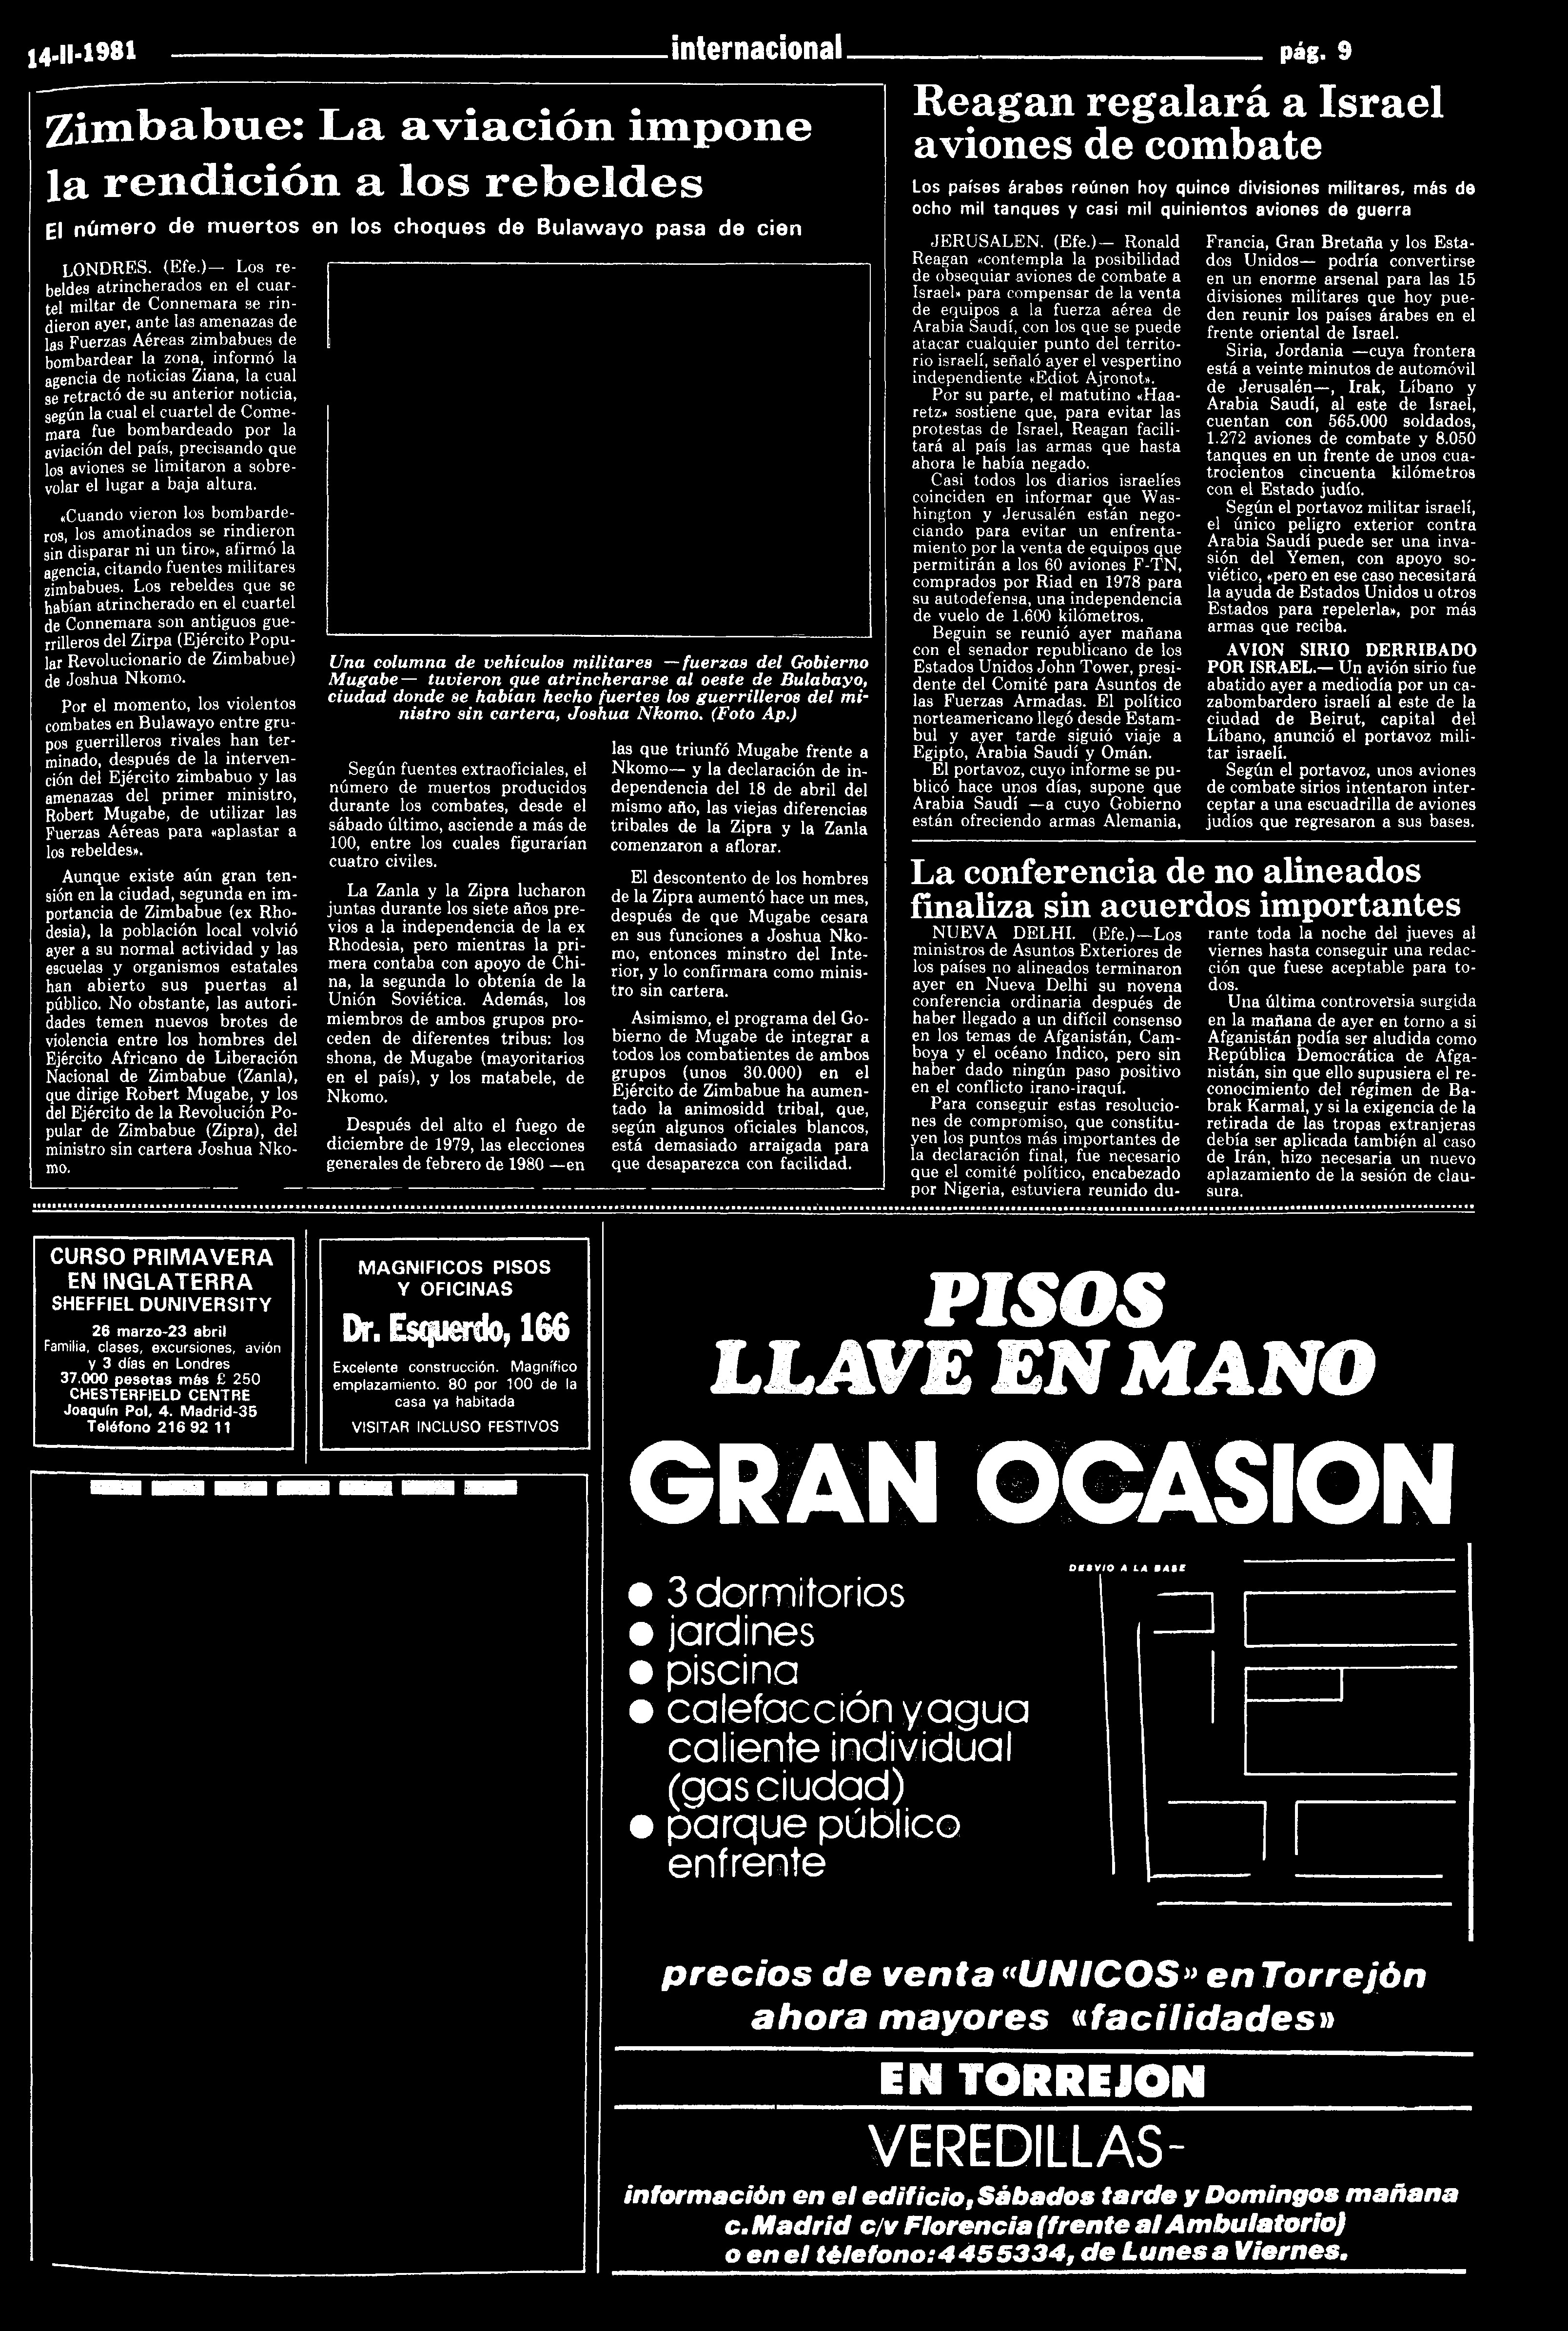 14 11 1981 internacional pág